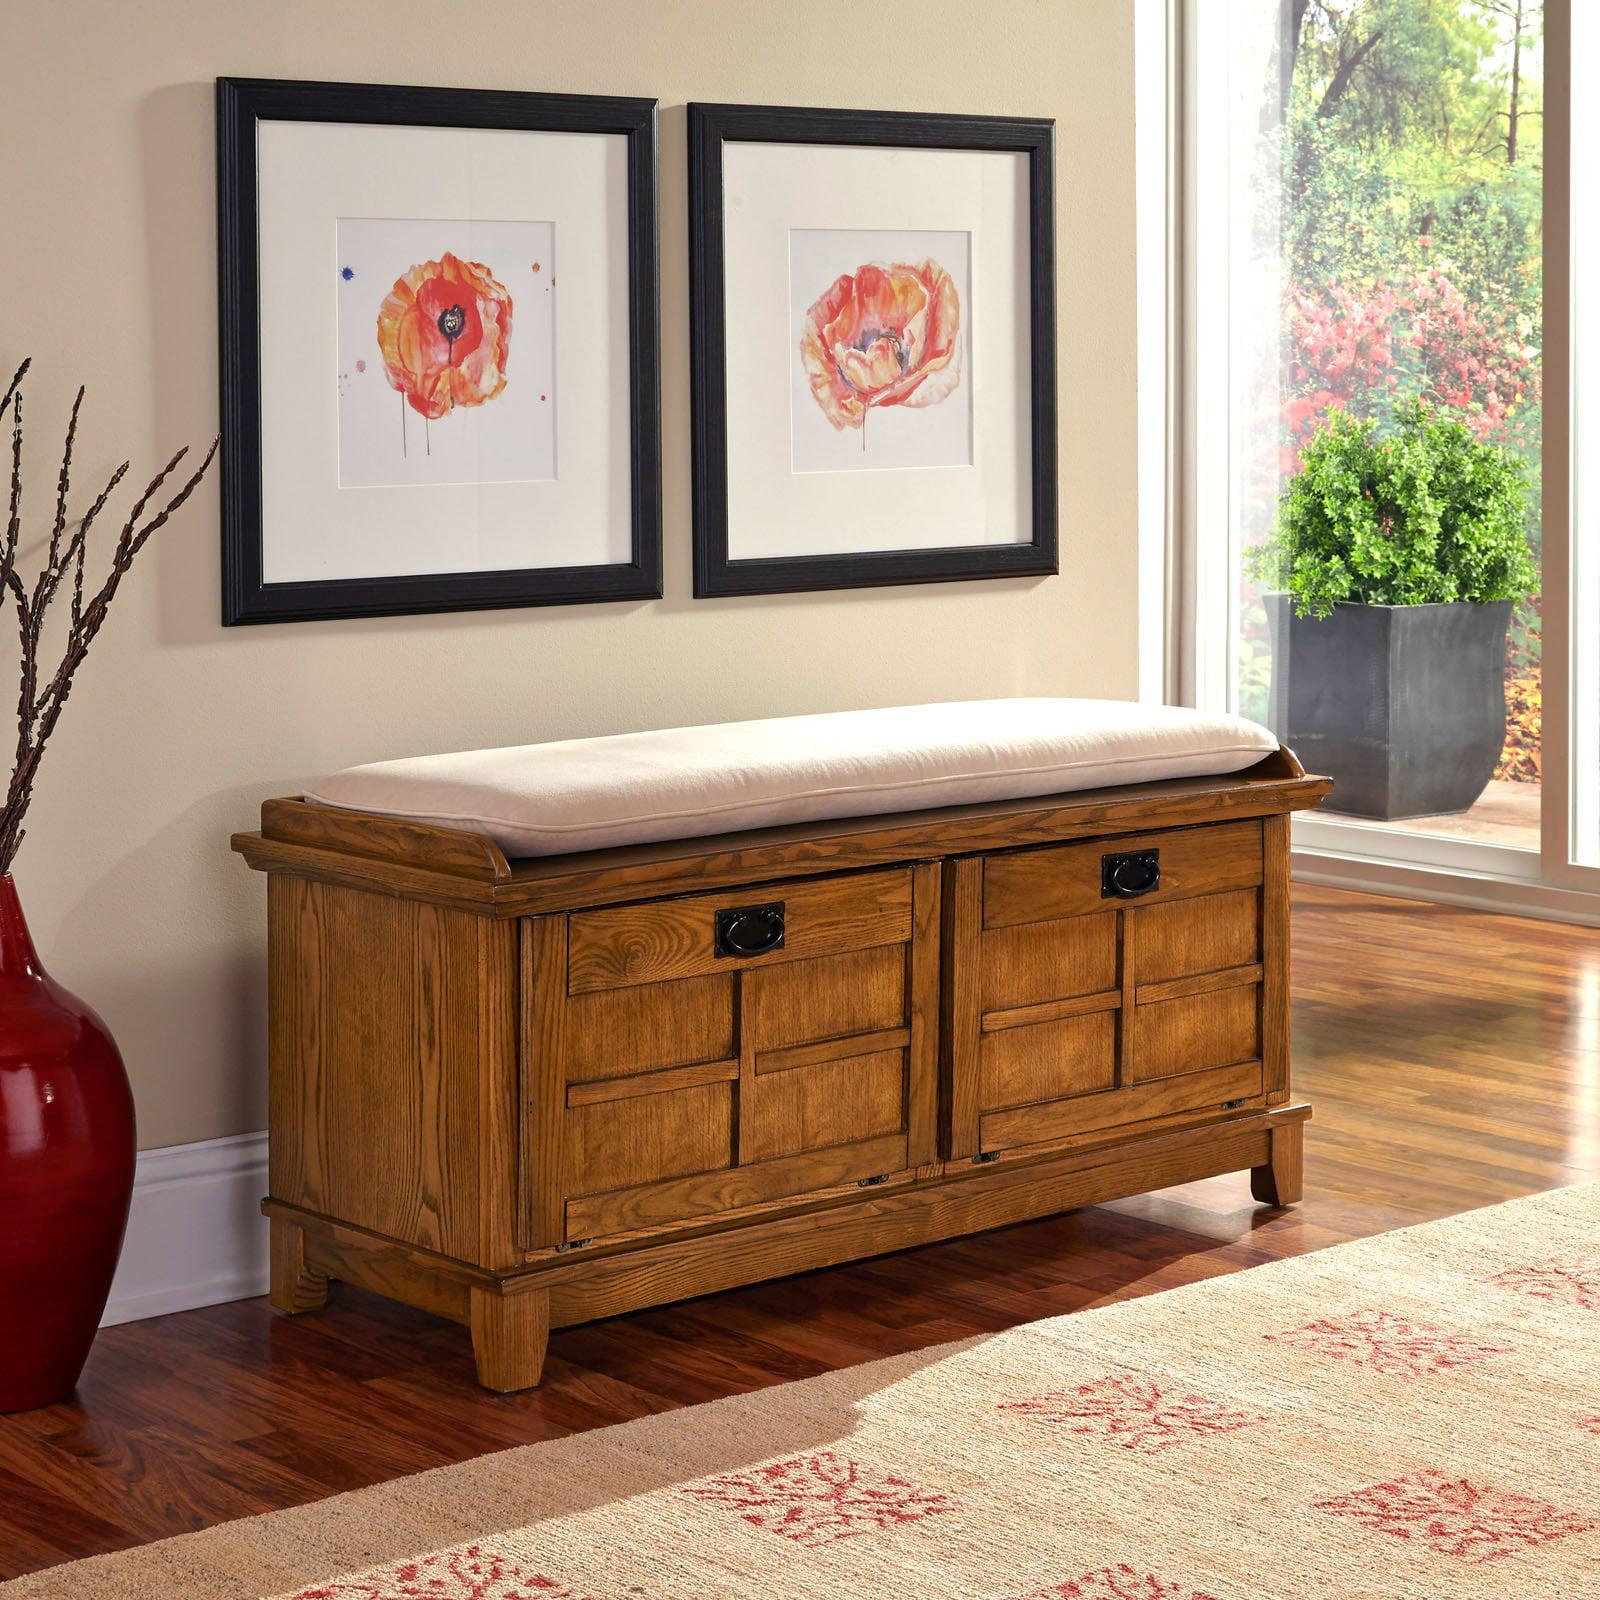 Genial Arts U0026 Crafts White Upholstered Bench   Walmart.com